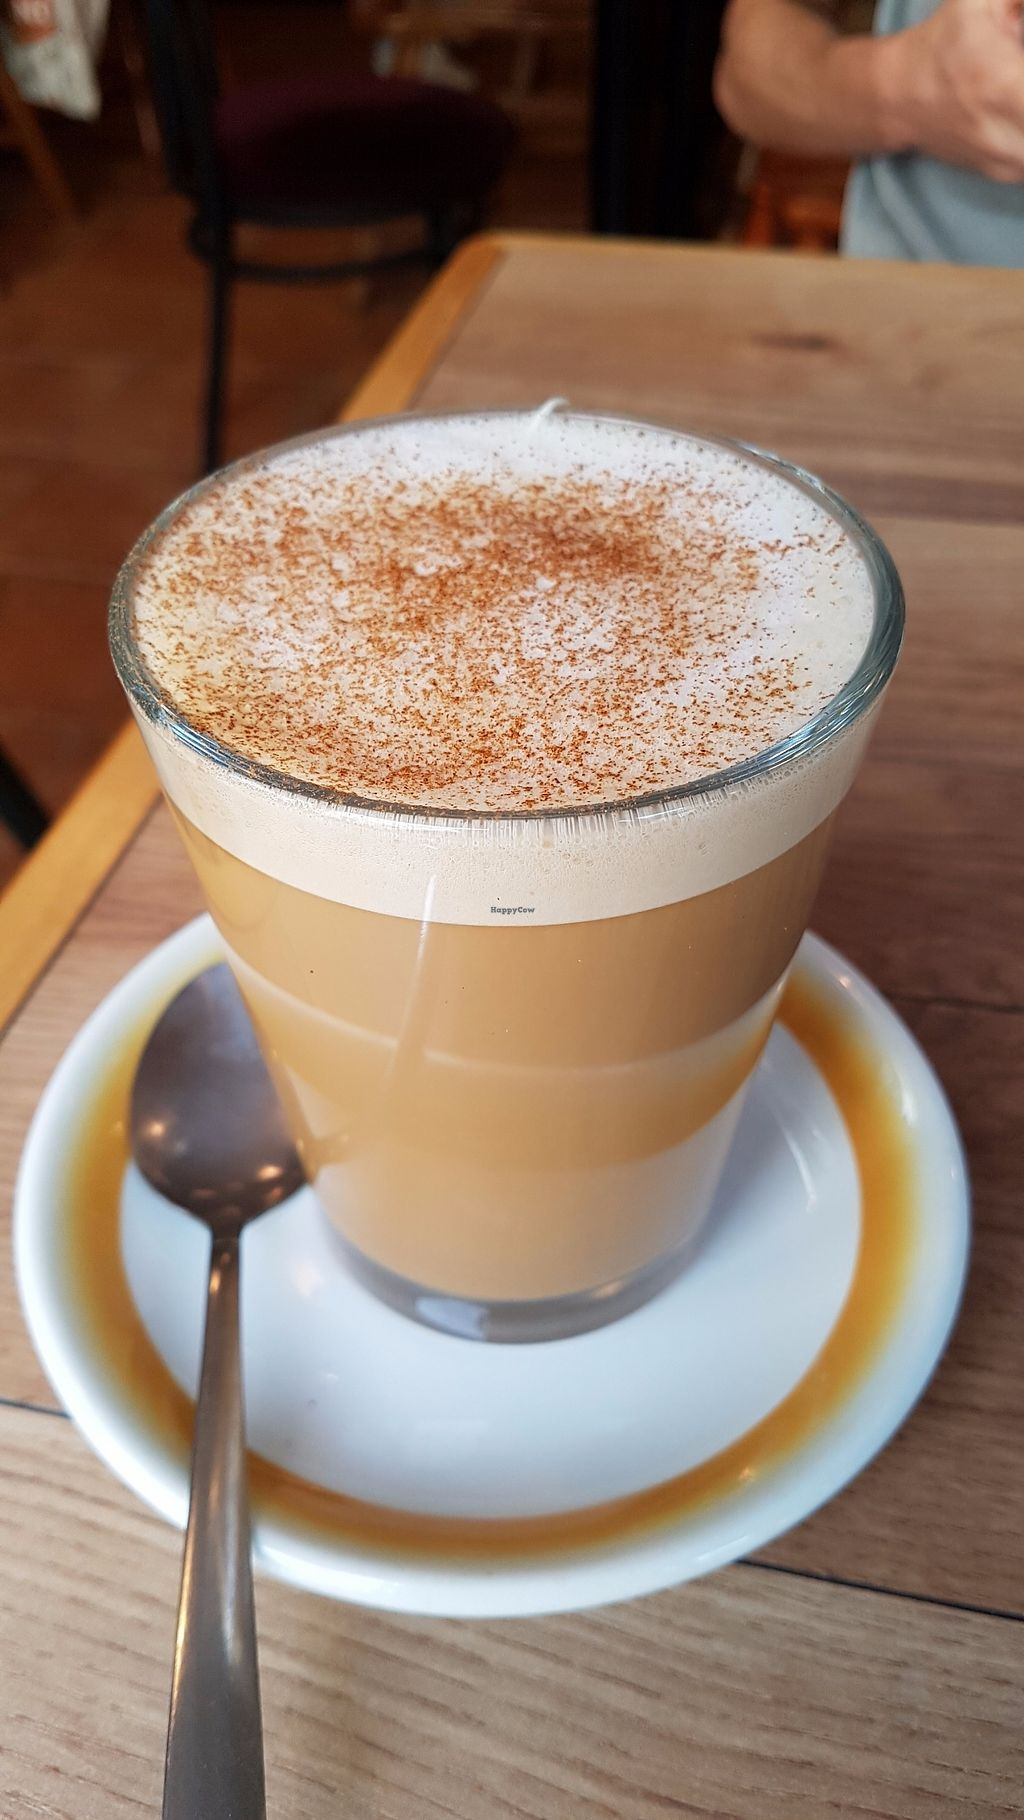 "Photo of Café Tuyo  by <a href=""/members/profile/JonJon"">JonJon</a> <br/>Tchai <br/> July 28, 2017  - <a href='/contact/abuse/image/58596/285780'>Report</a>"